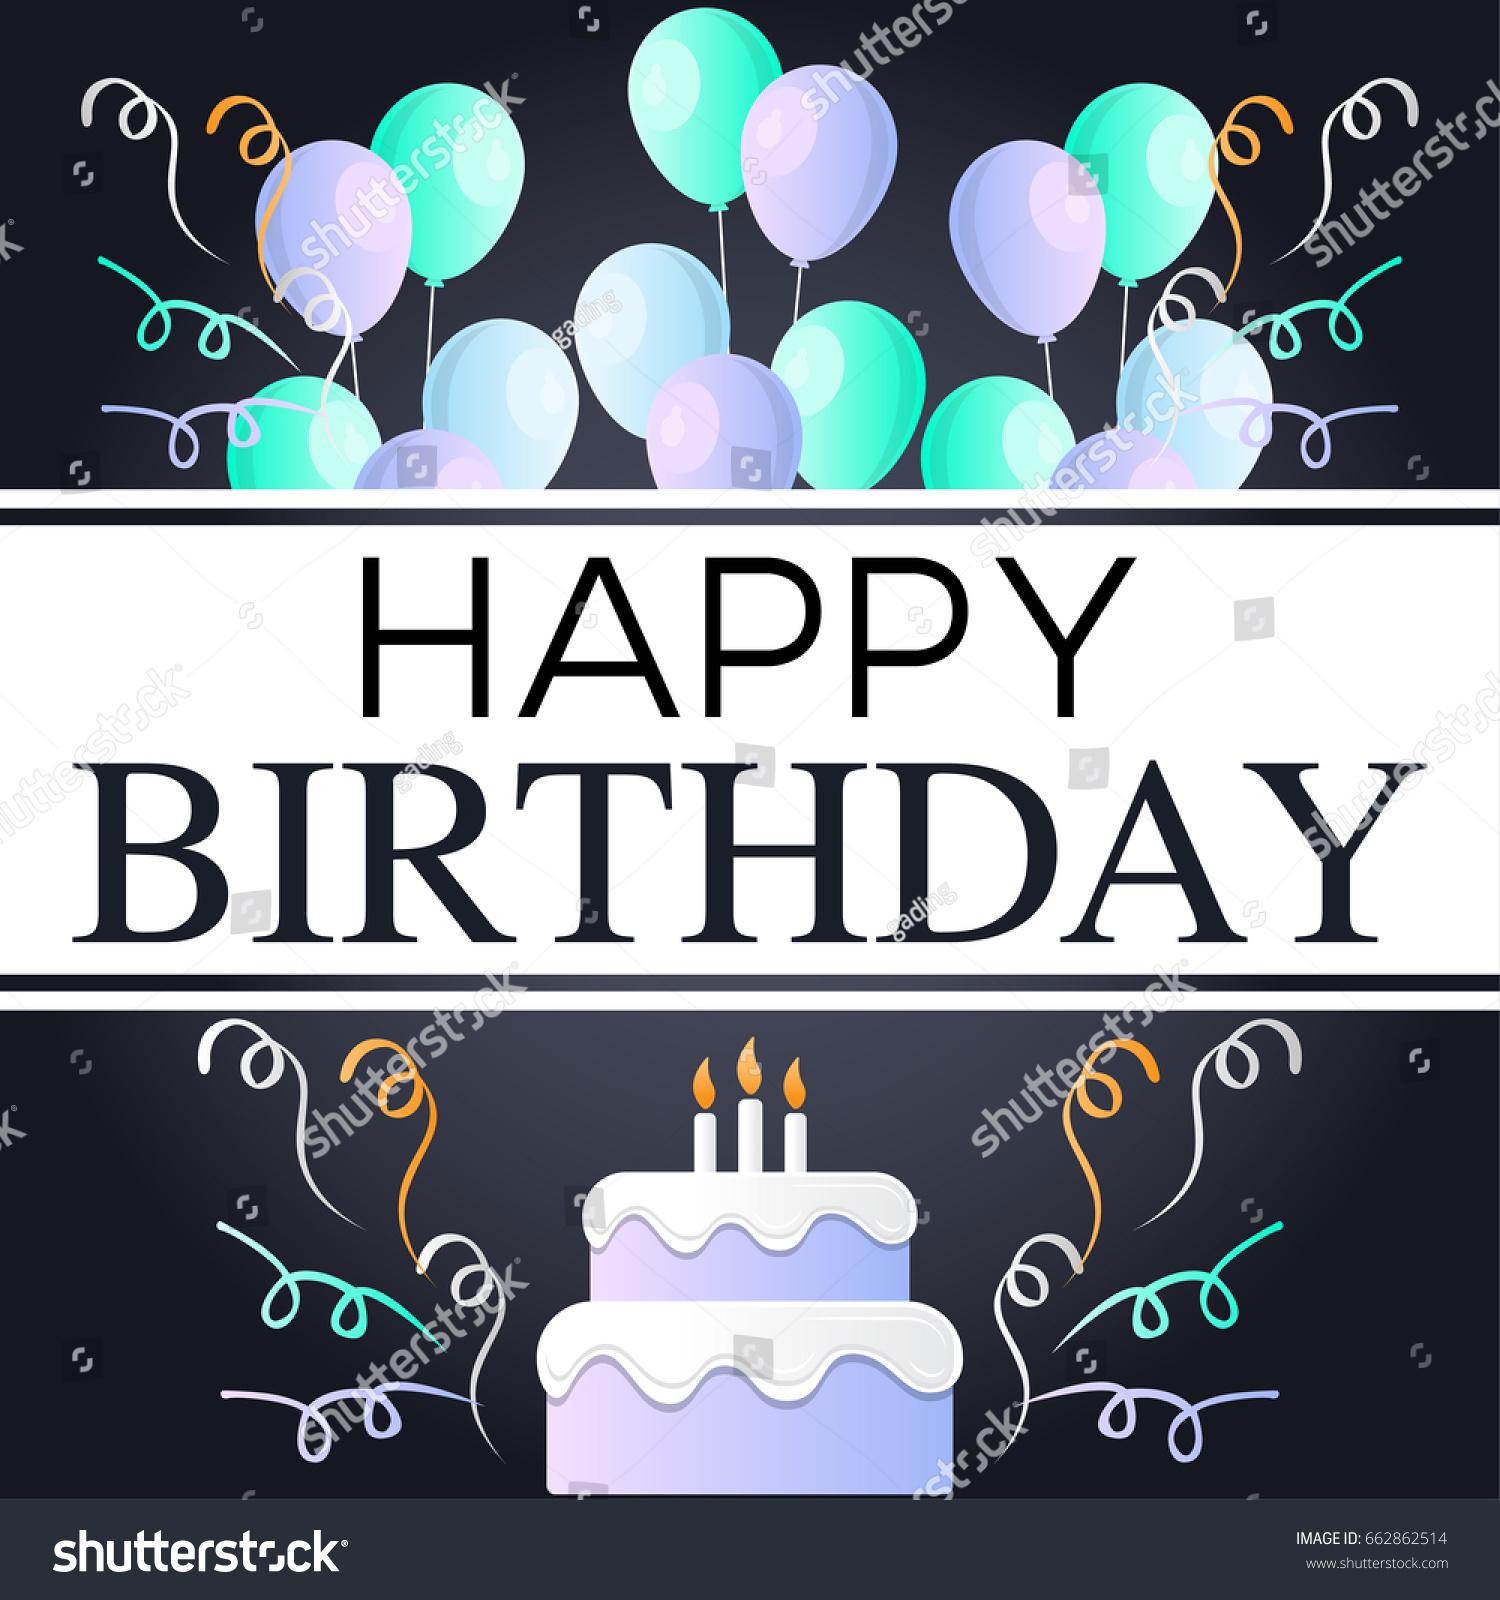 https www shutterstock com image vector birthday invitation background design 662862514